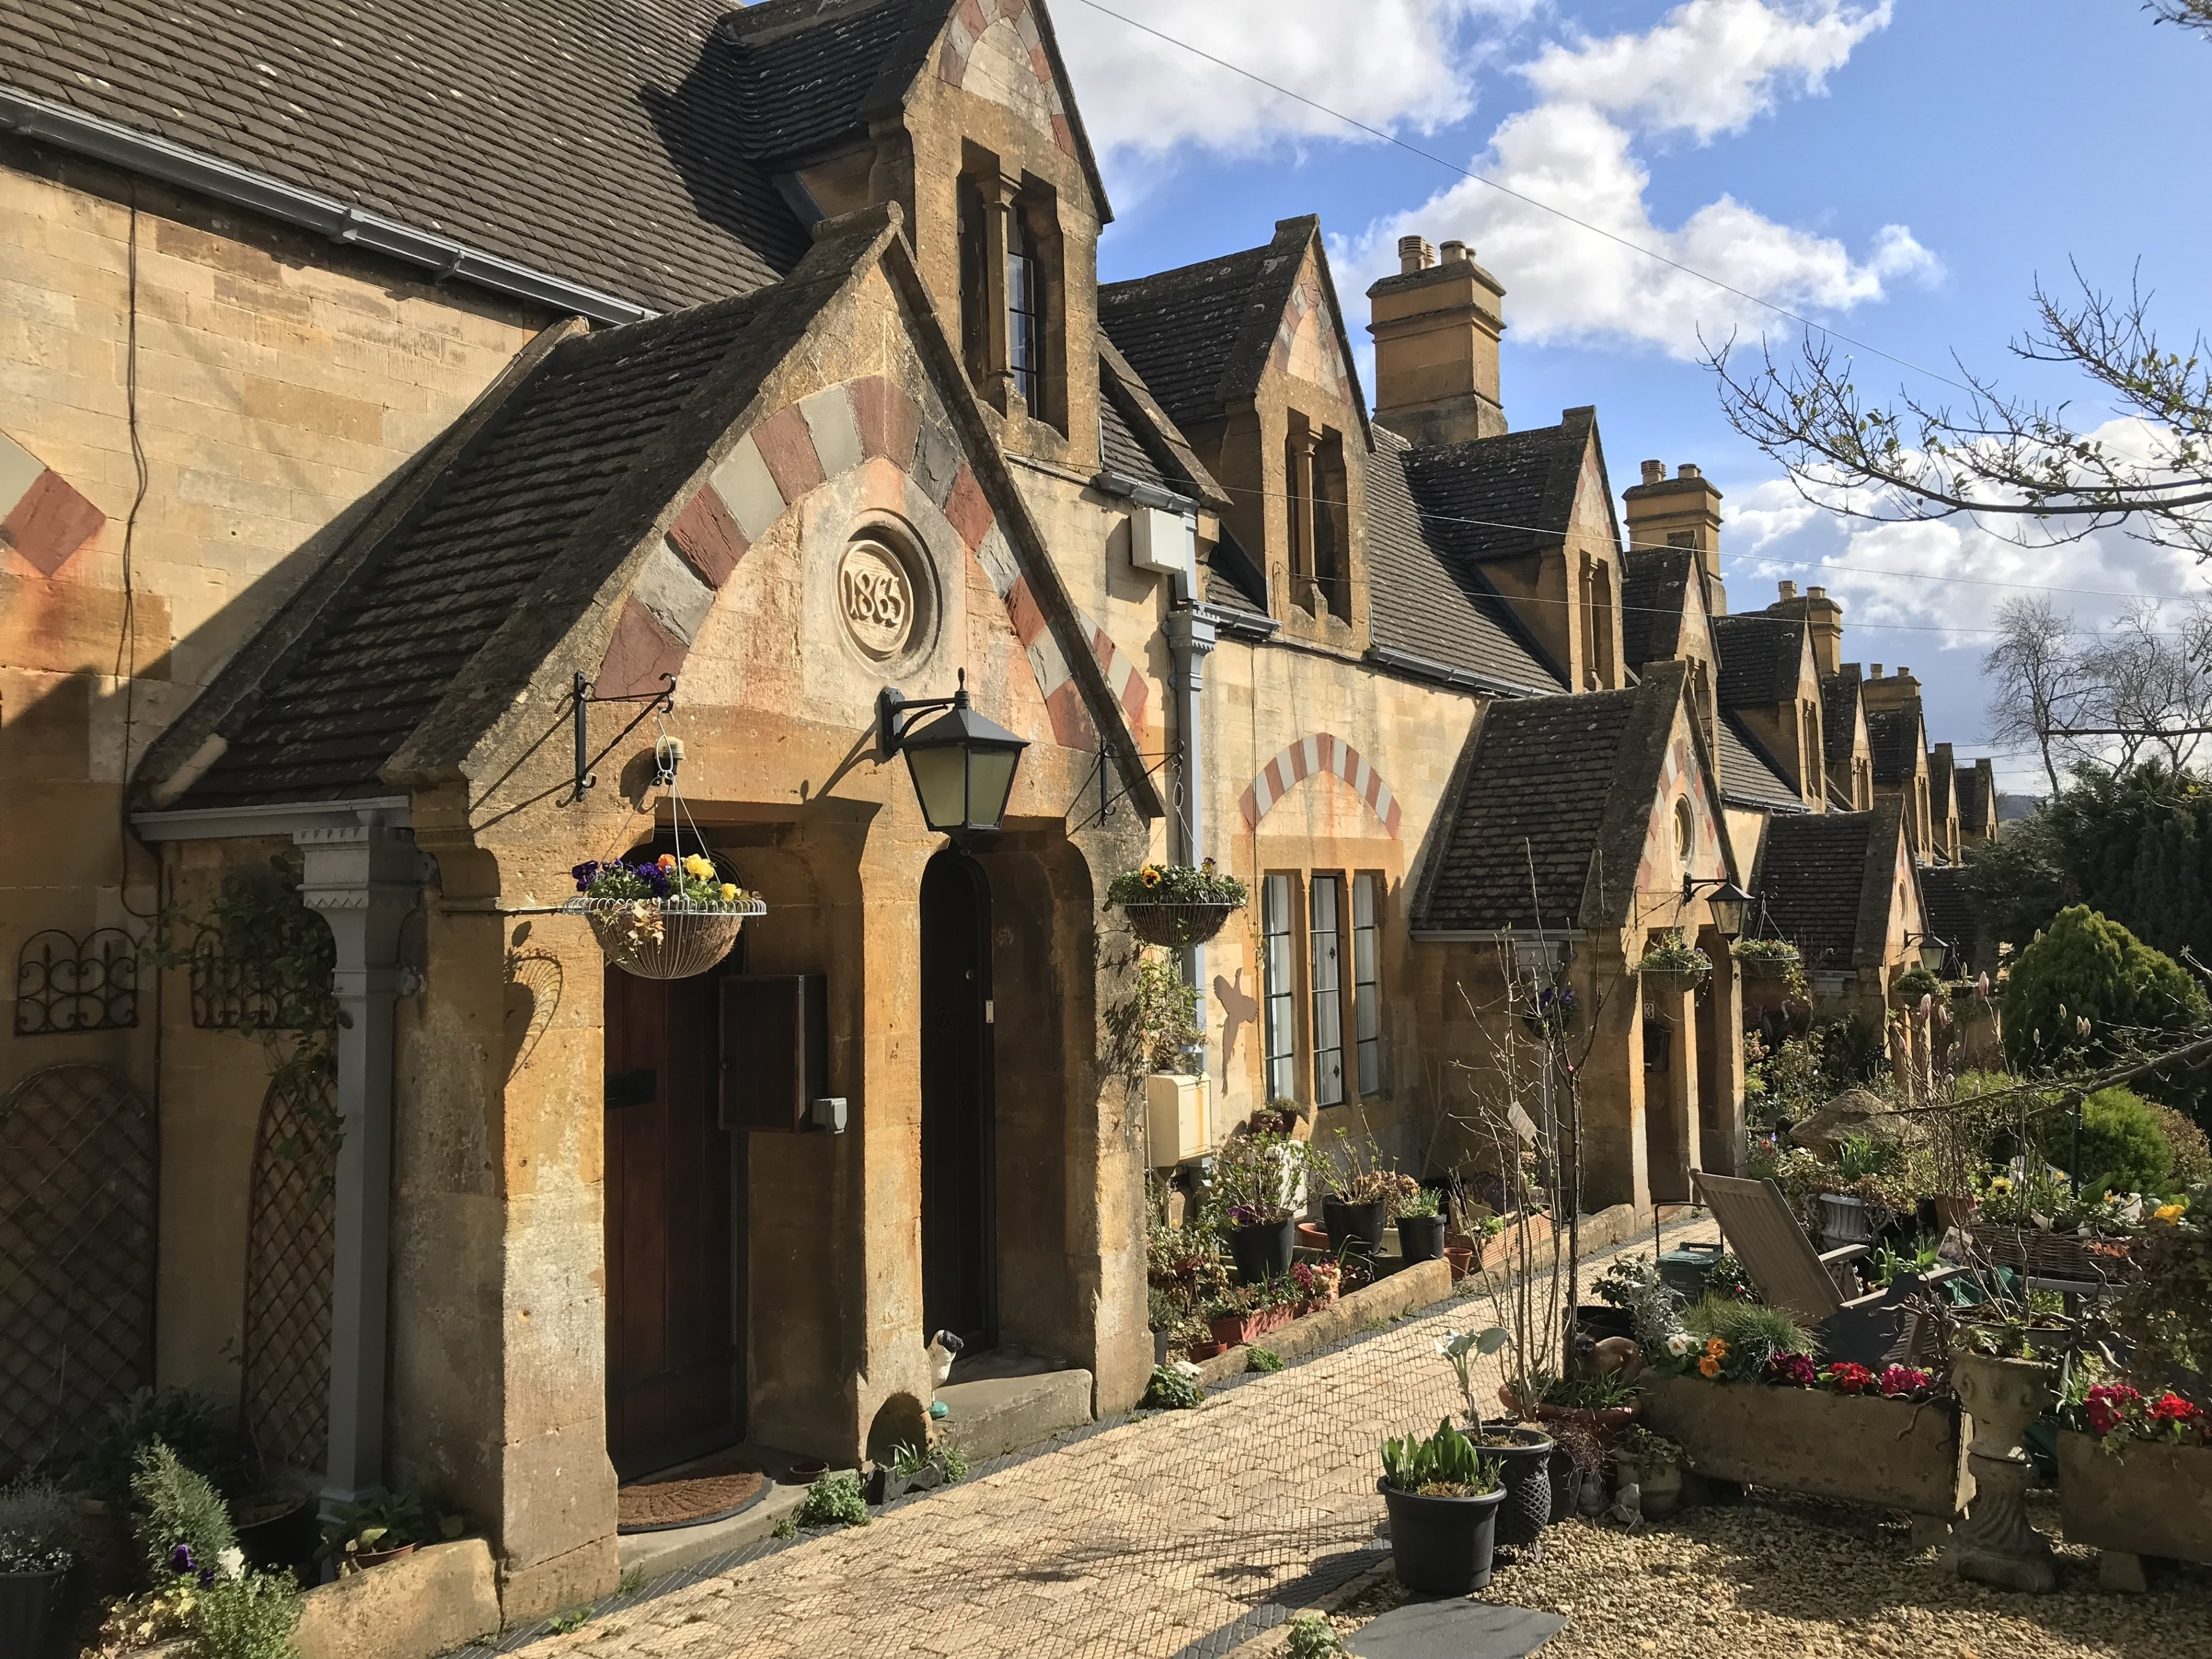 Cotswolds, England, United Kingdom